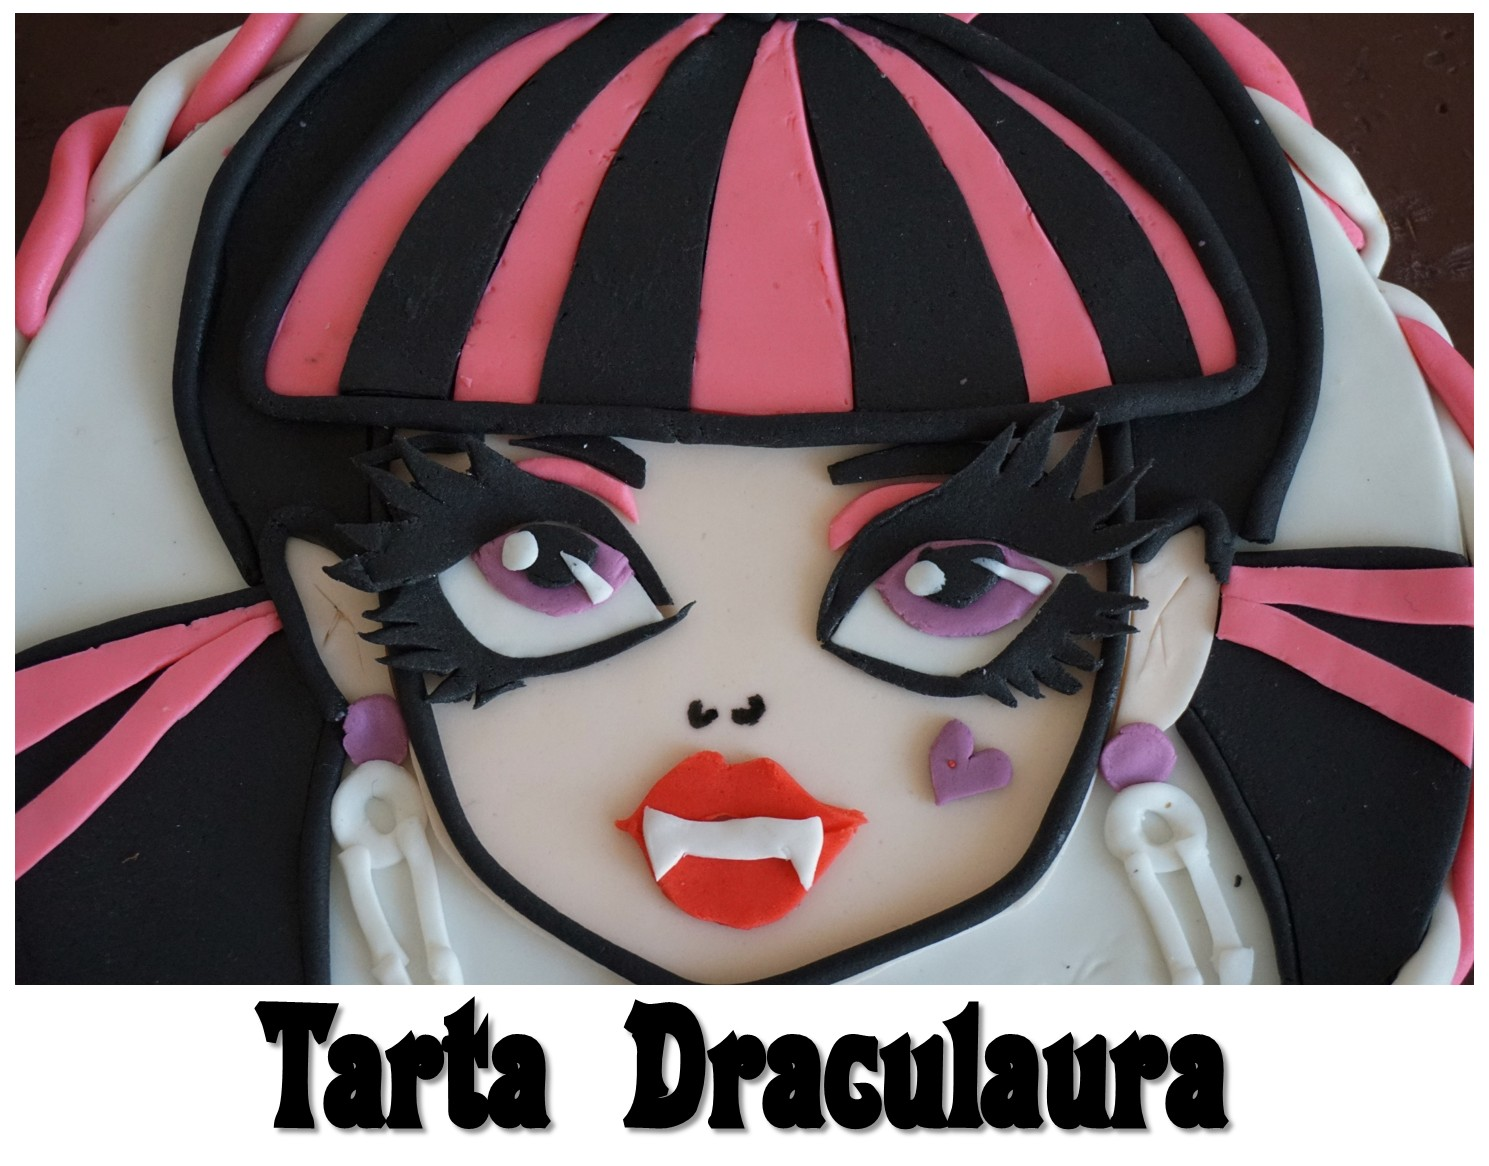 Draculaura2